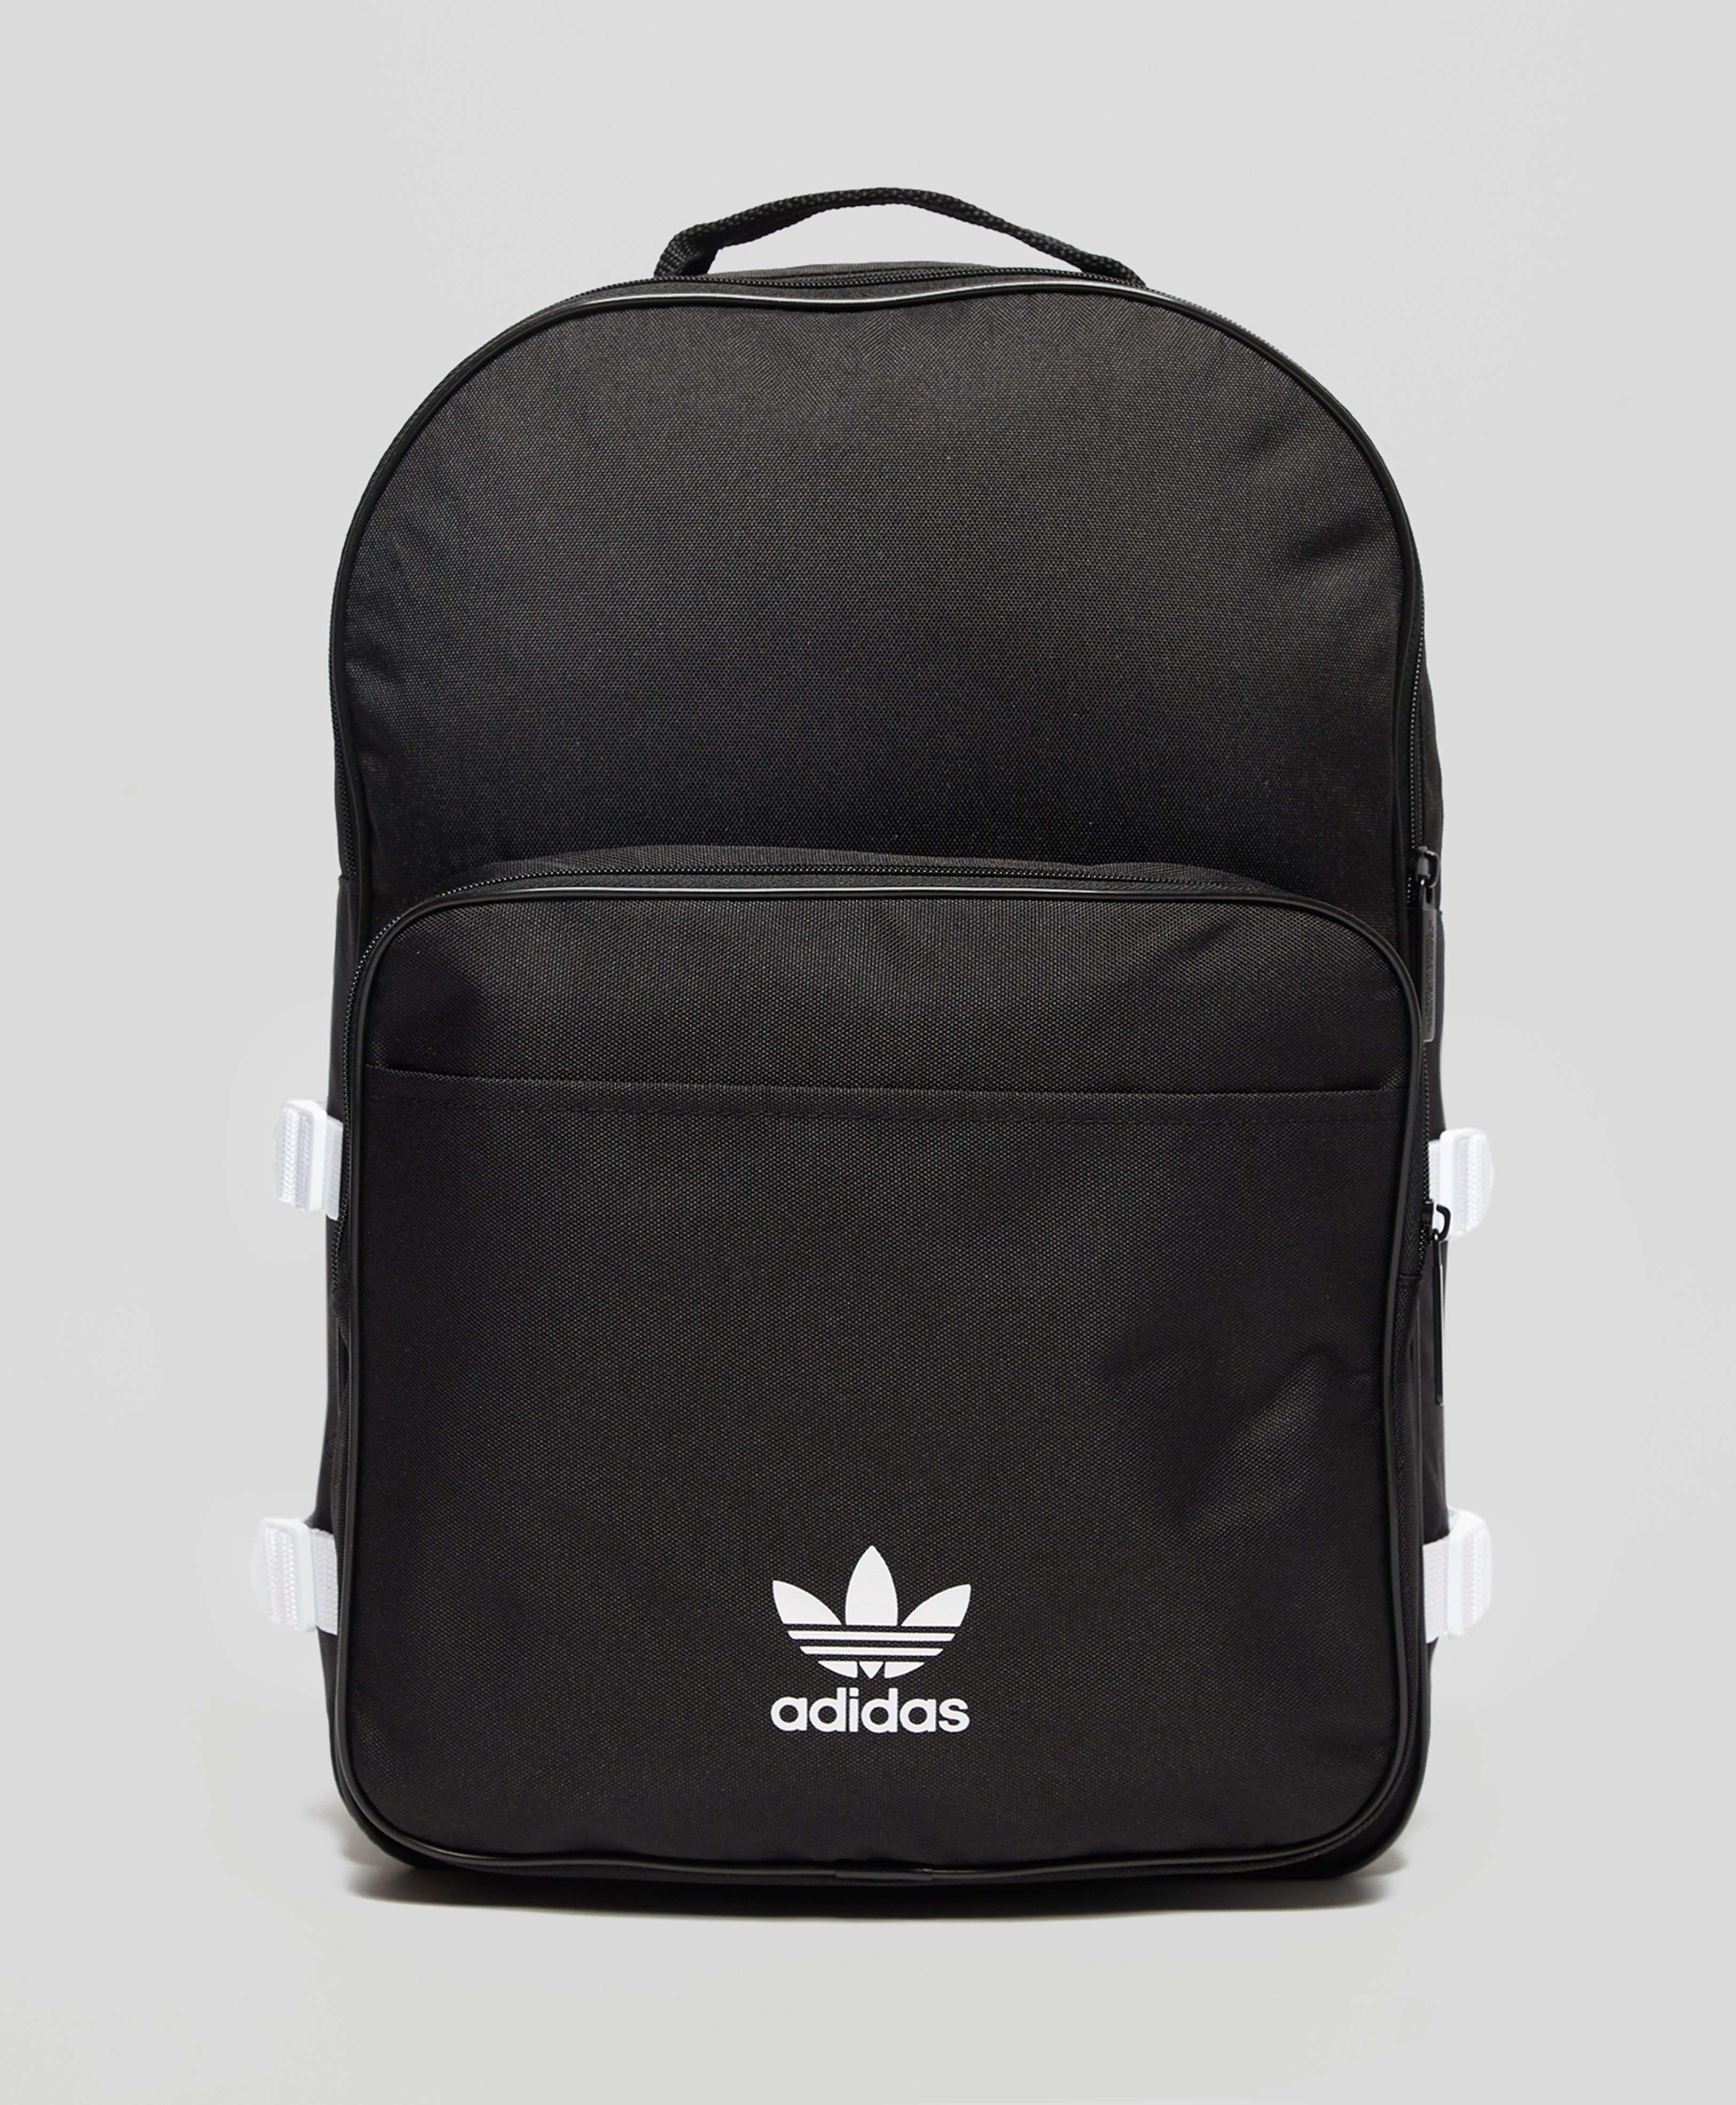 adidas Originals Essential Backpack